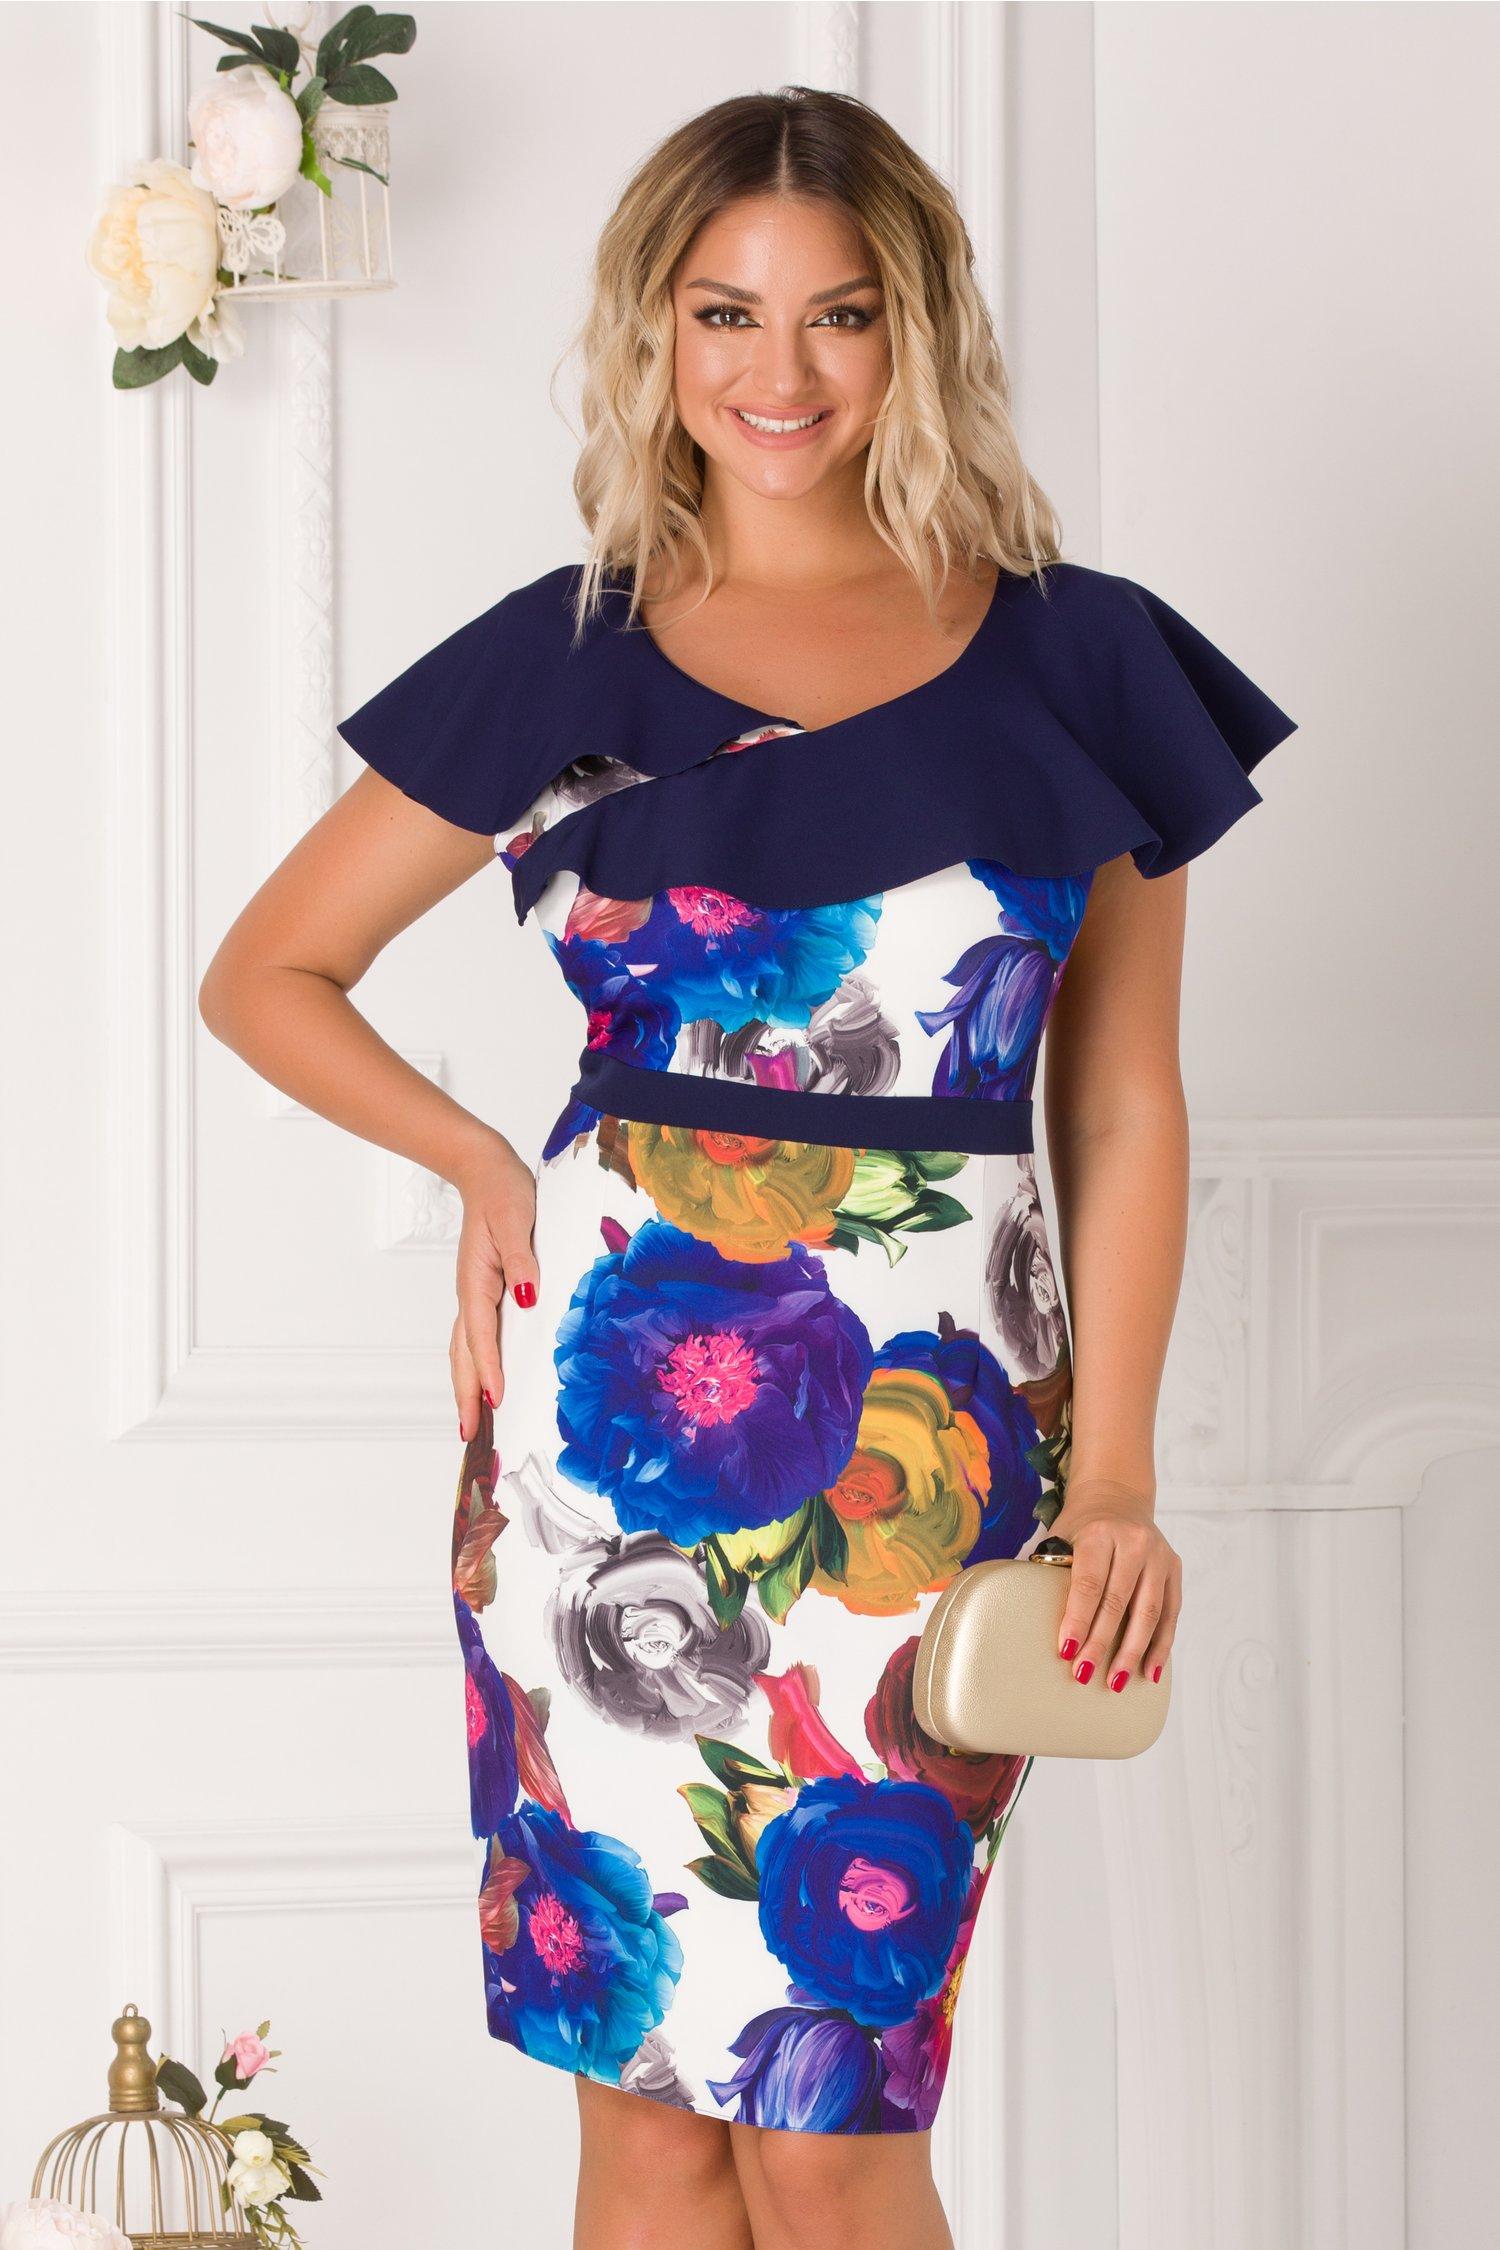 Rochie Patry cu imprimeu floral colorat si volane bleumarin la bust